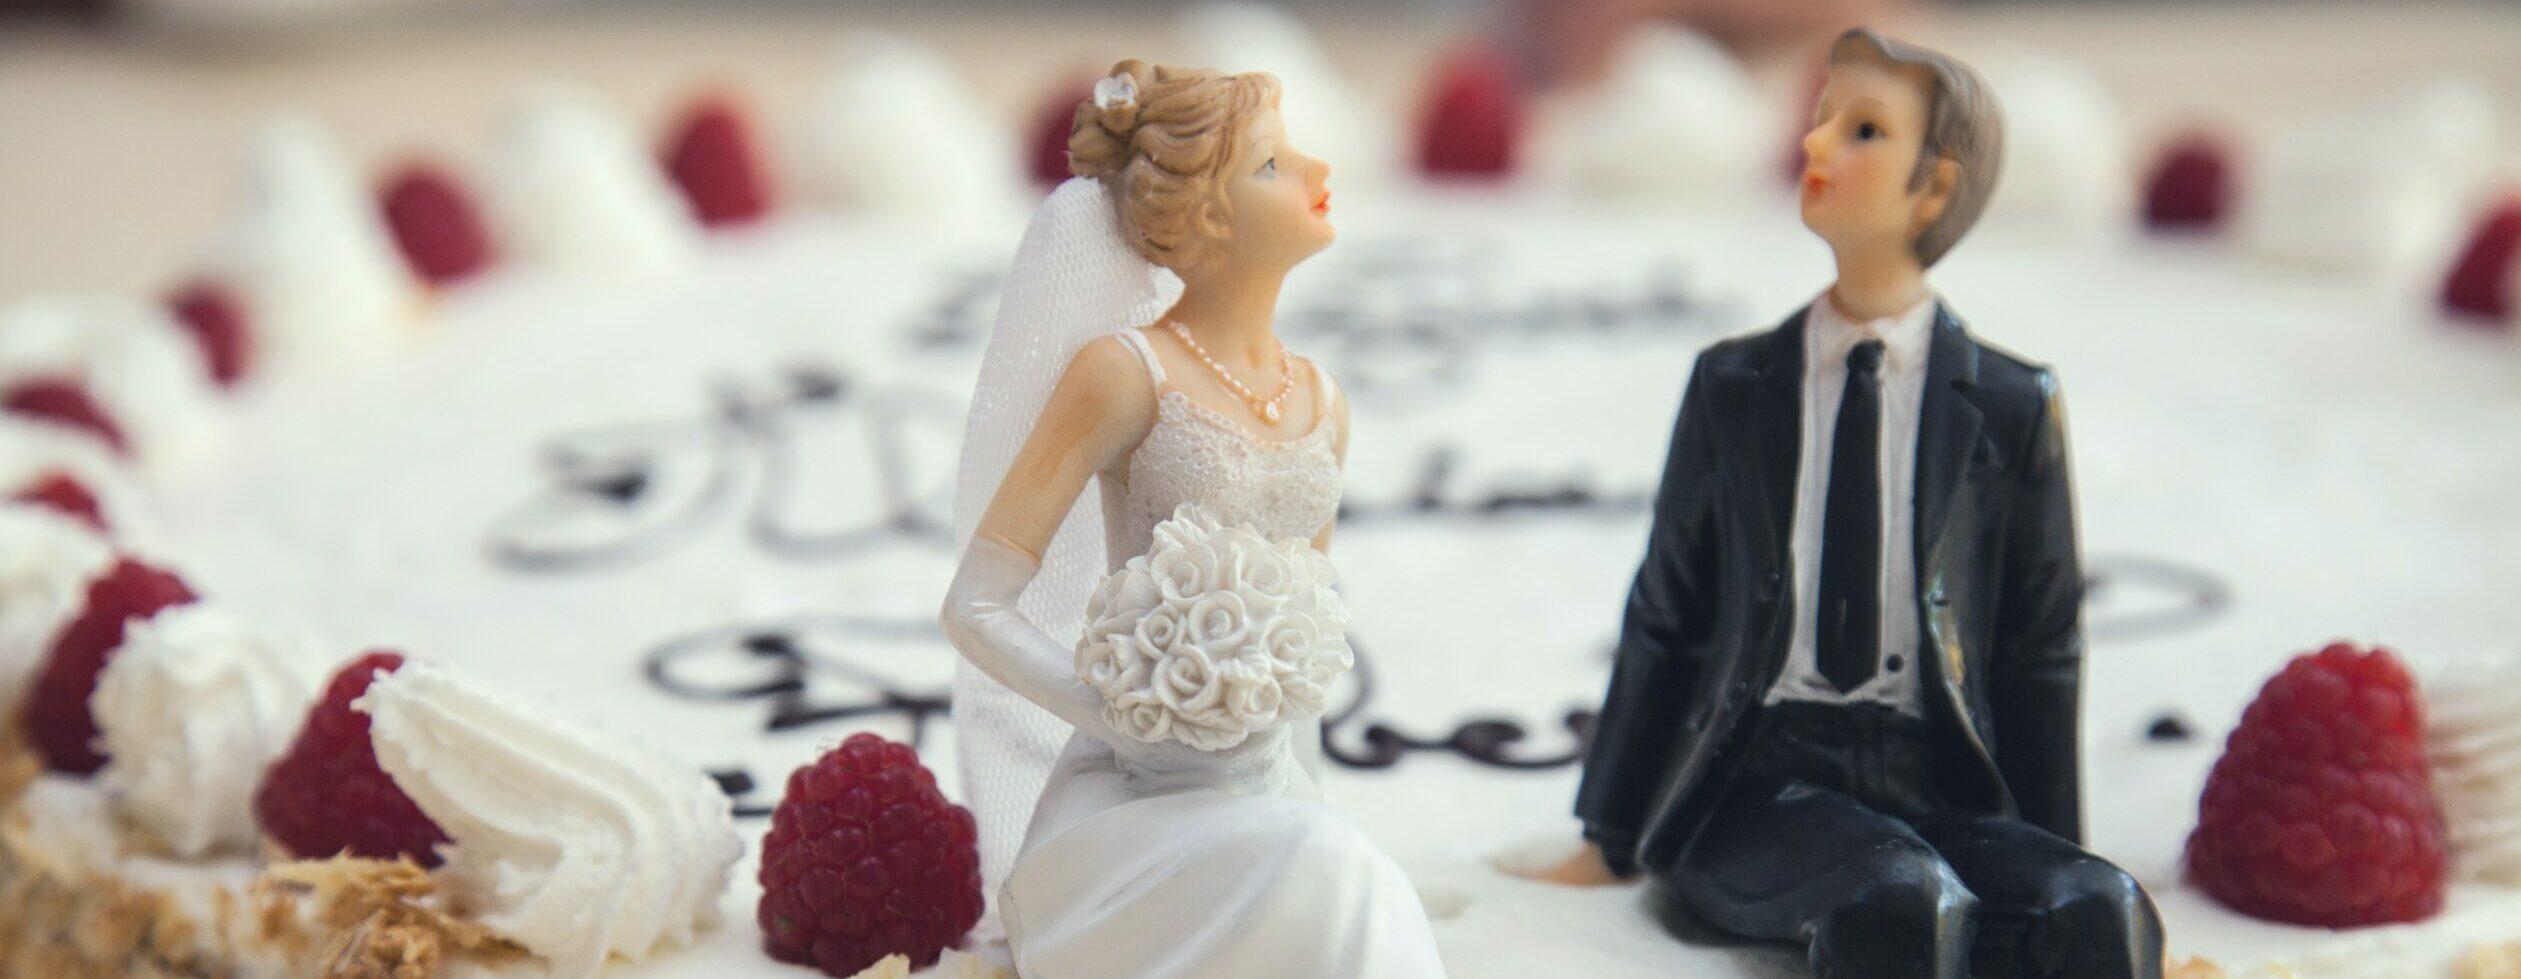 figurki pary młodej siedzącej na torcie